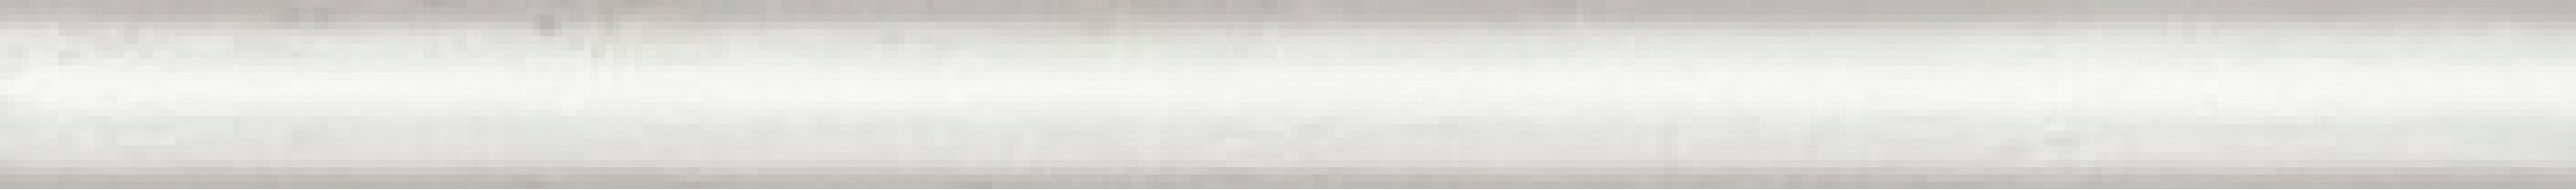 Спецэлемент CSAQRPGR20 Q R Pensiero Grigio 1.5x20 Sant Agostino